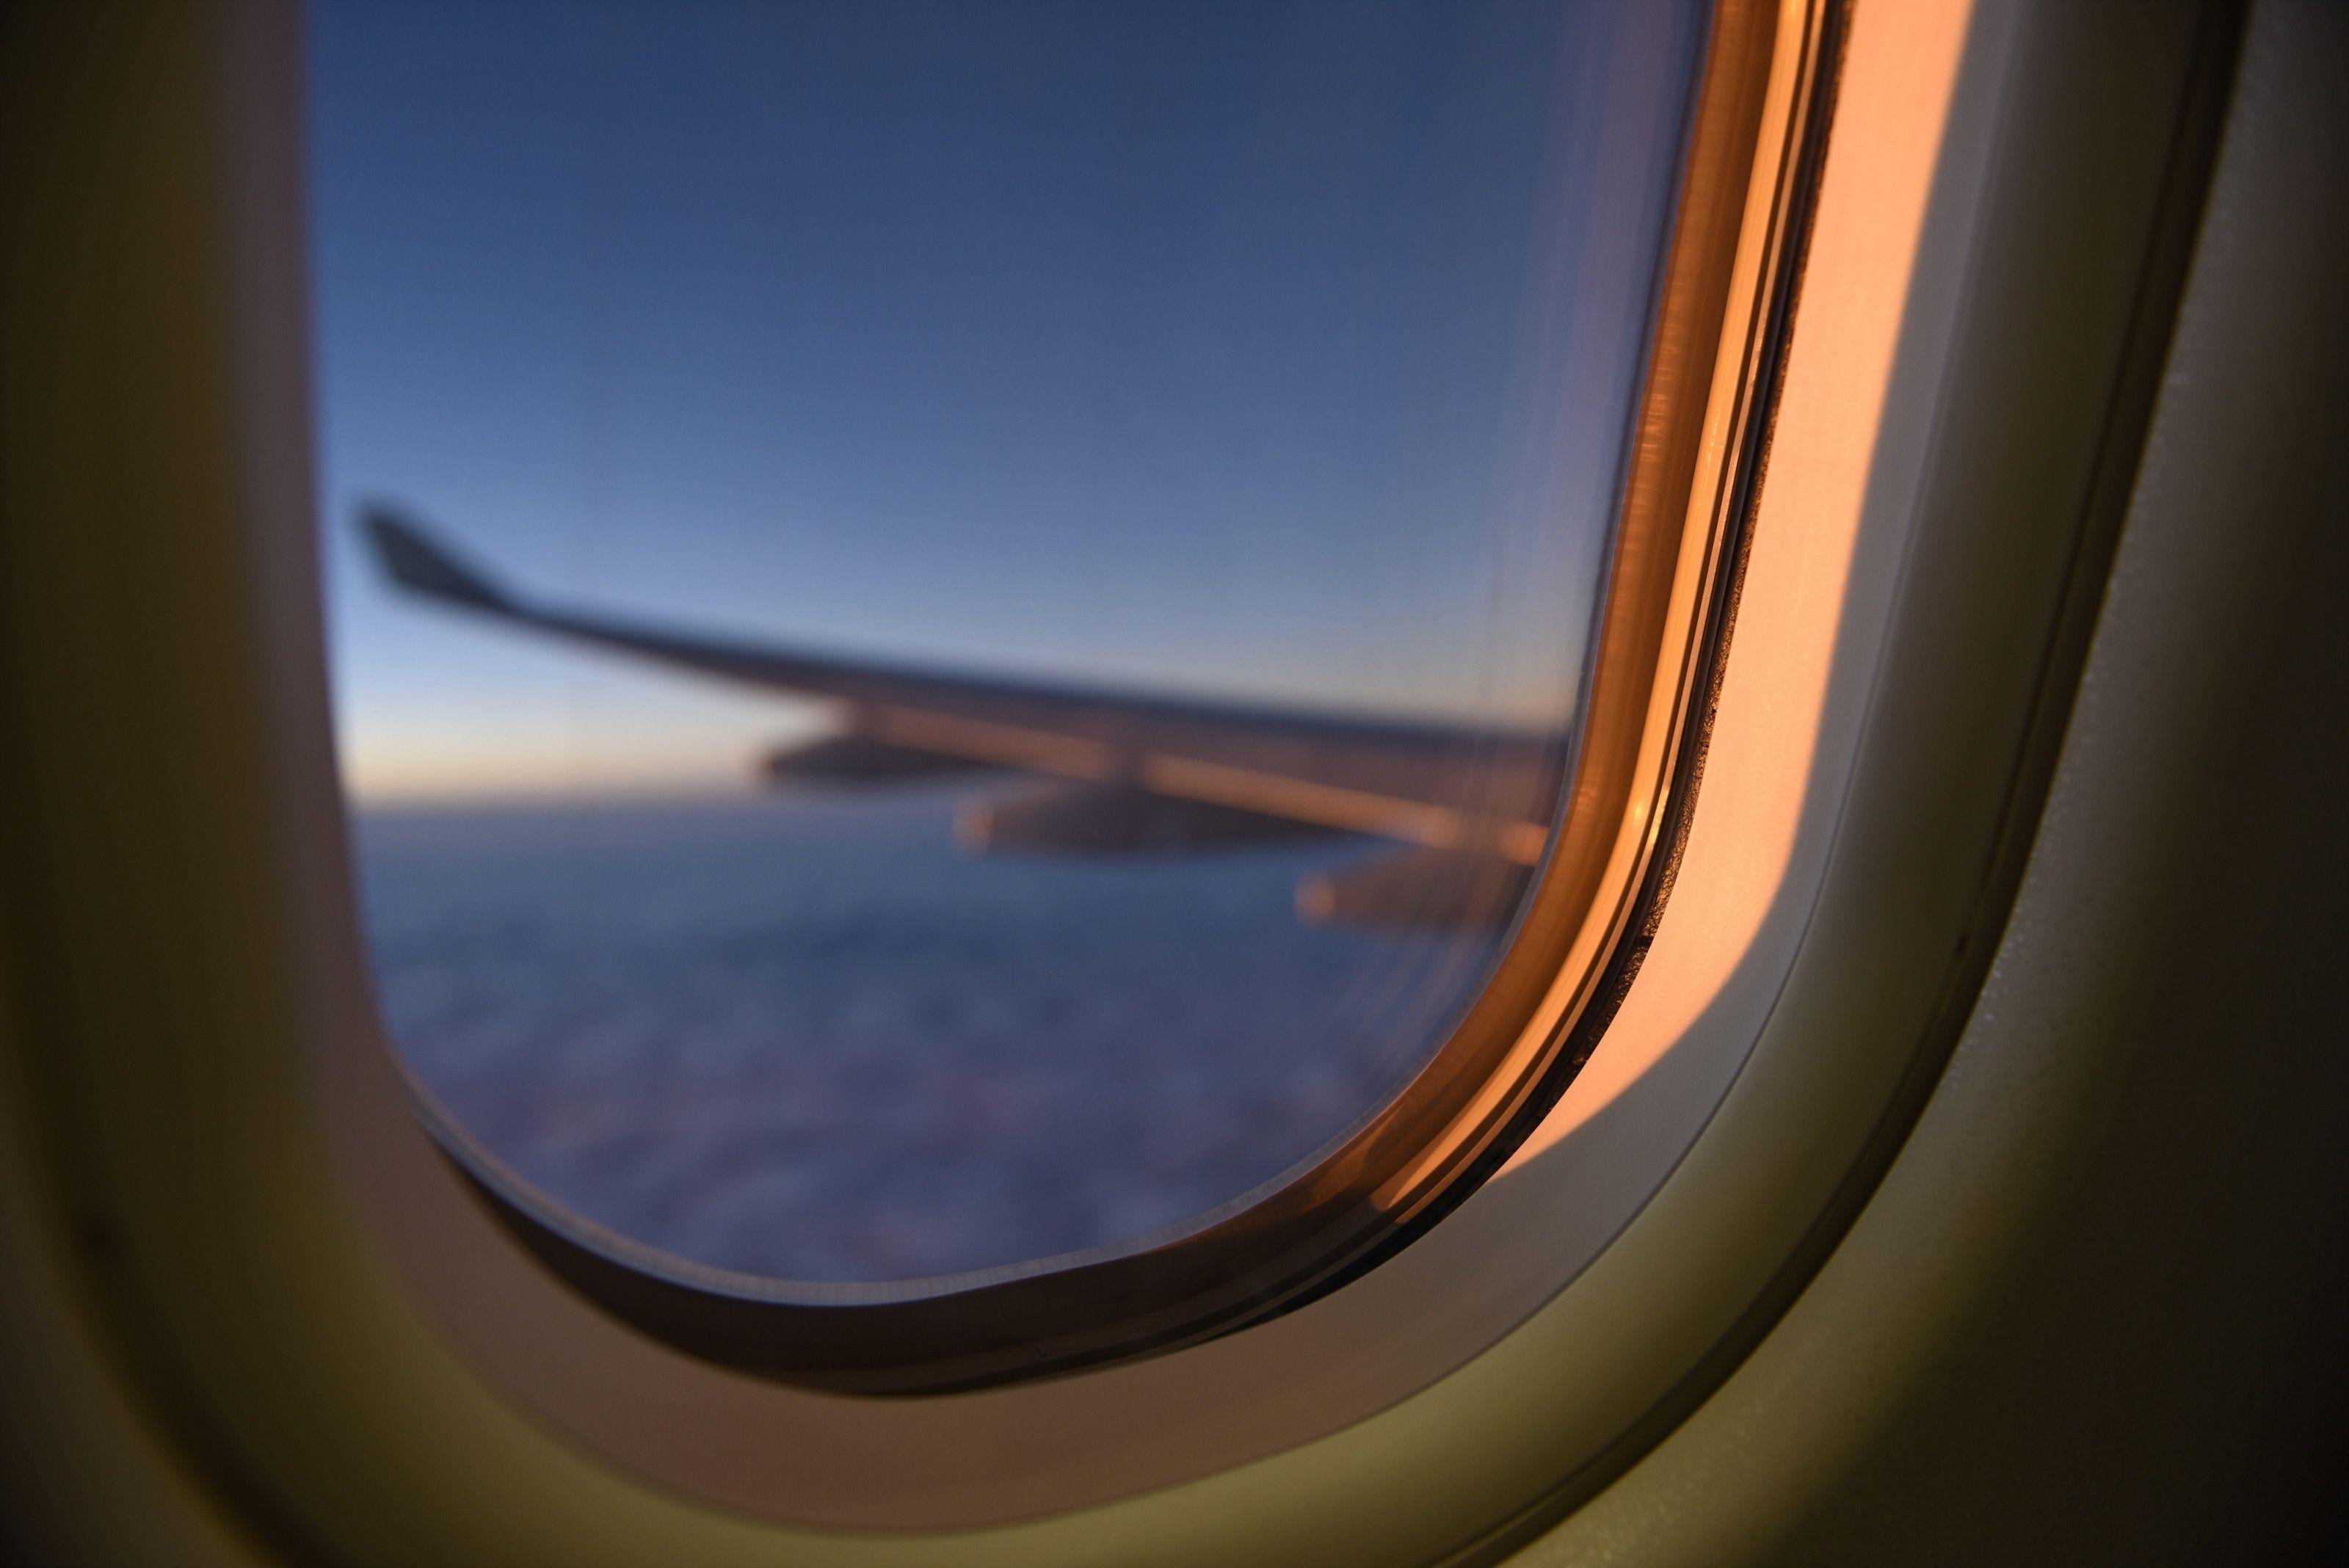 Cheap Flights from Abu Dhabi